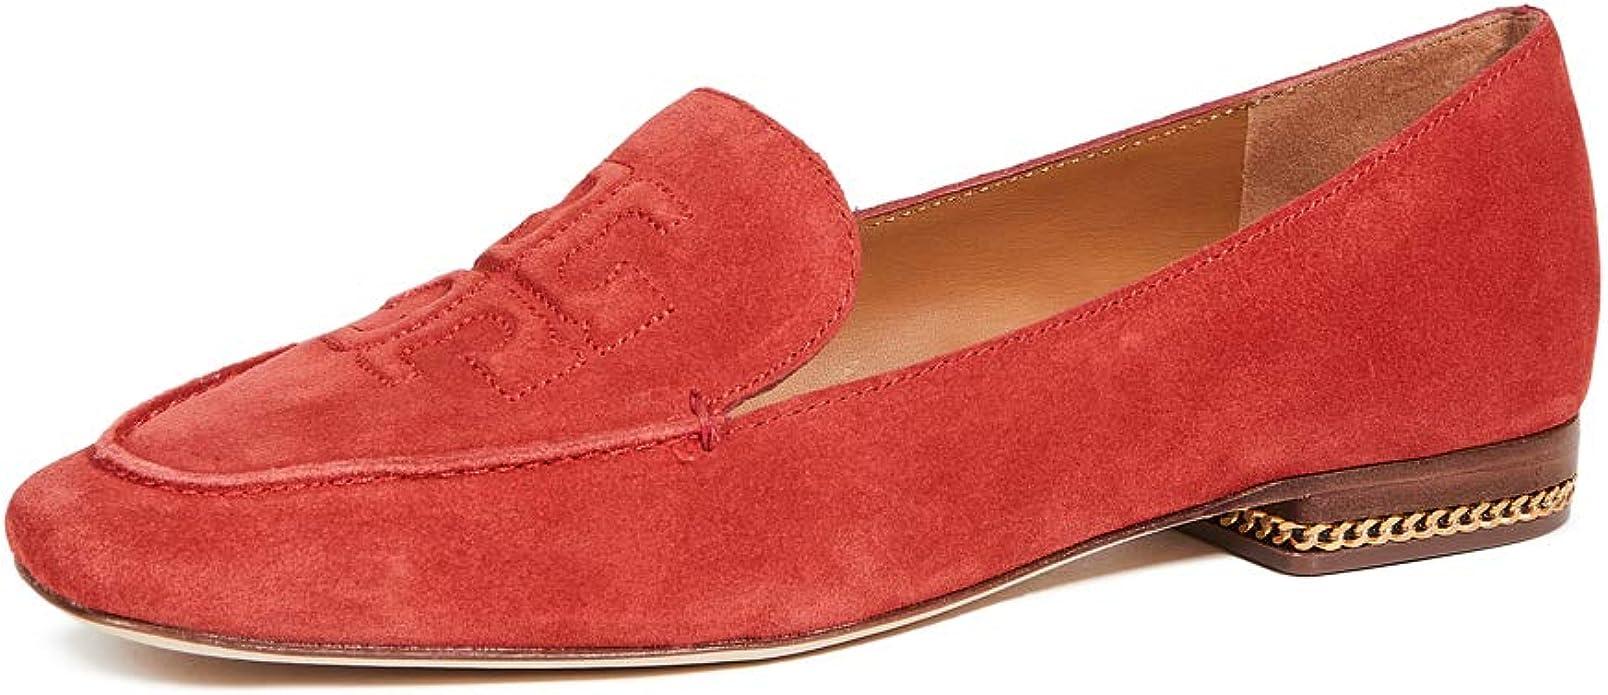 15mm Loafers, Bright Carnelian